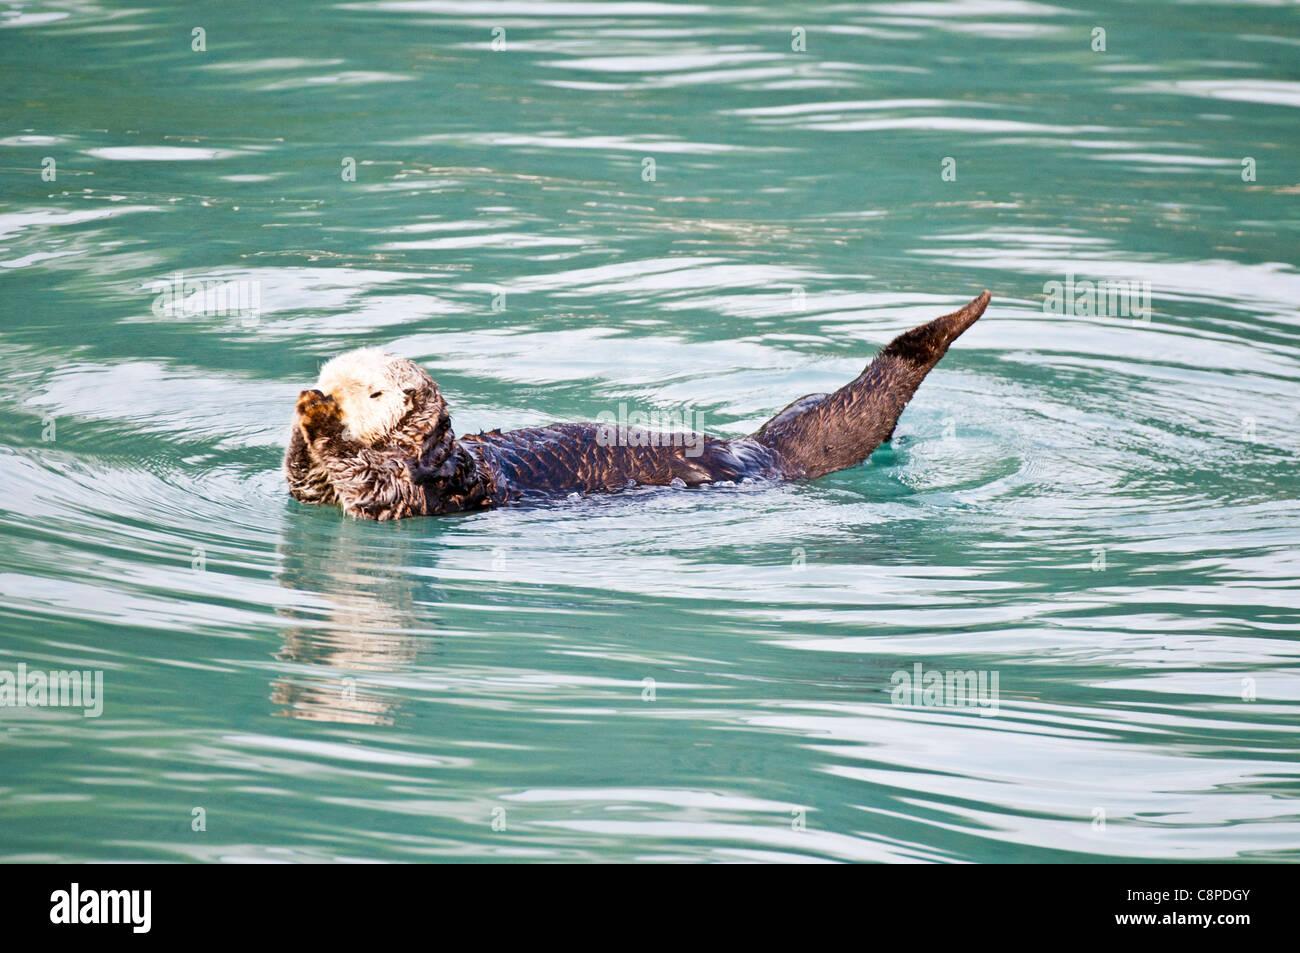 Sea Otter floating in ocean off Seward, Alaska - Stock Image